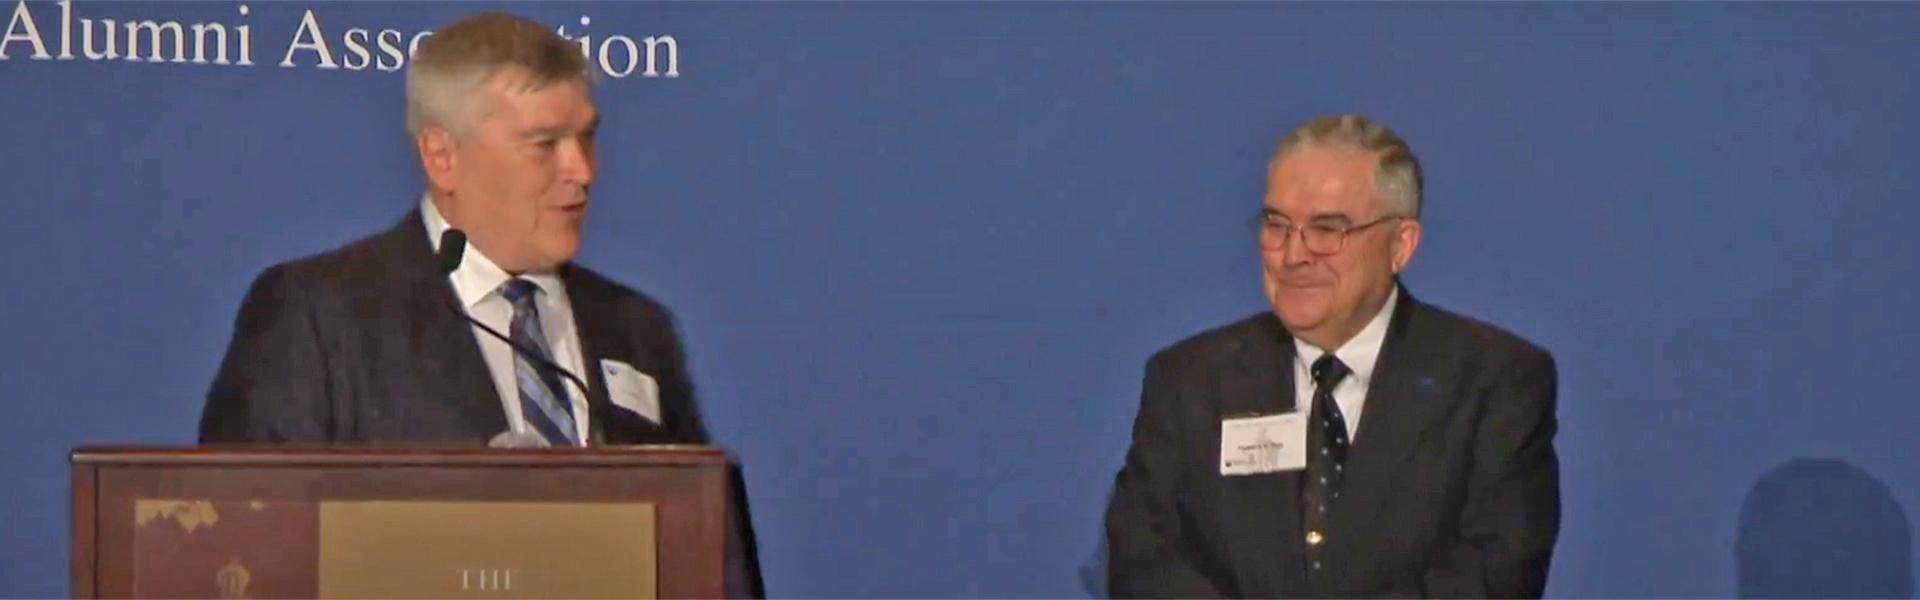 Delbert Day and President Barron